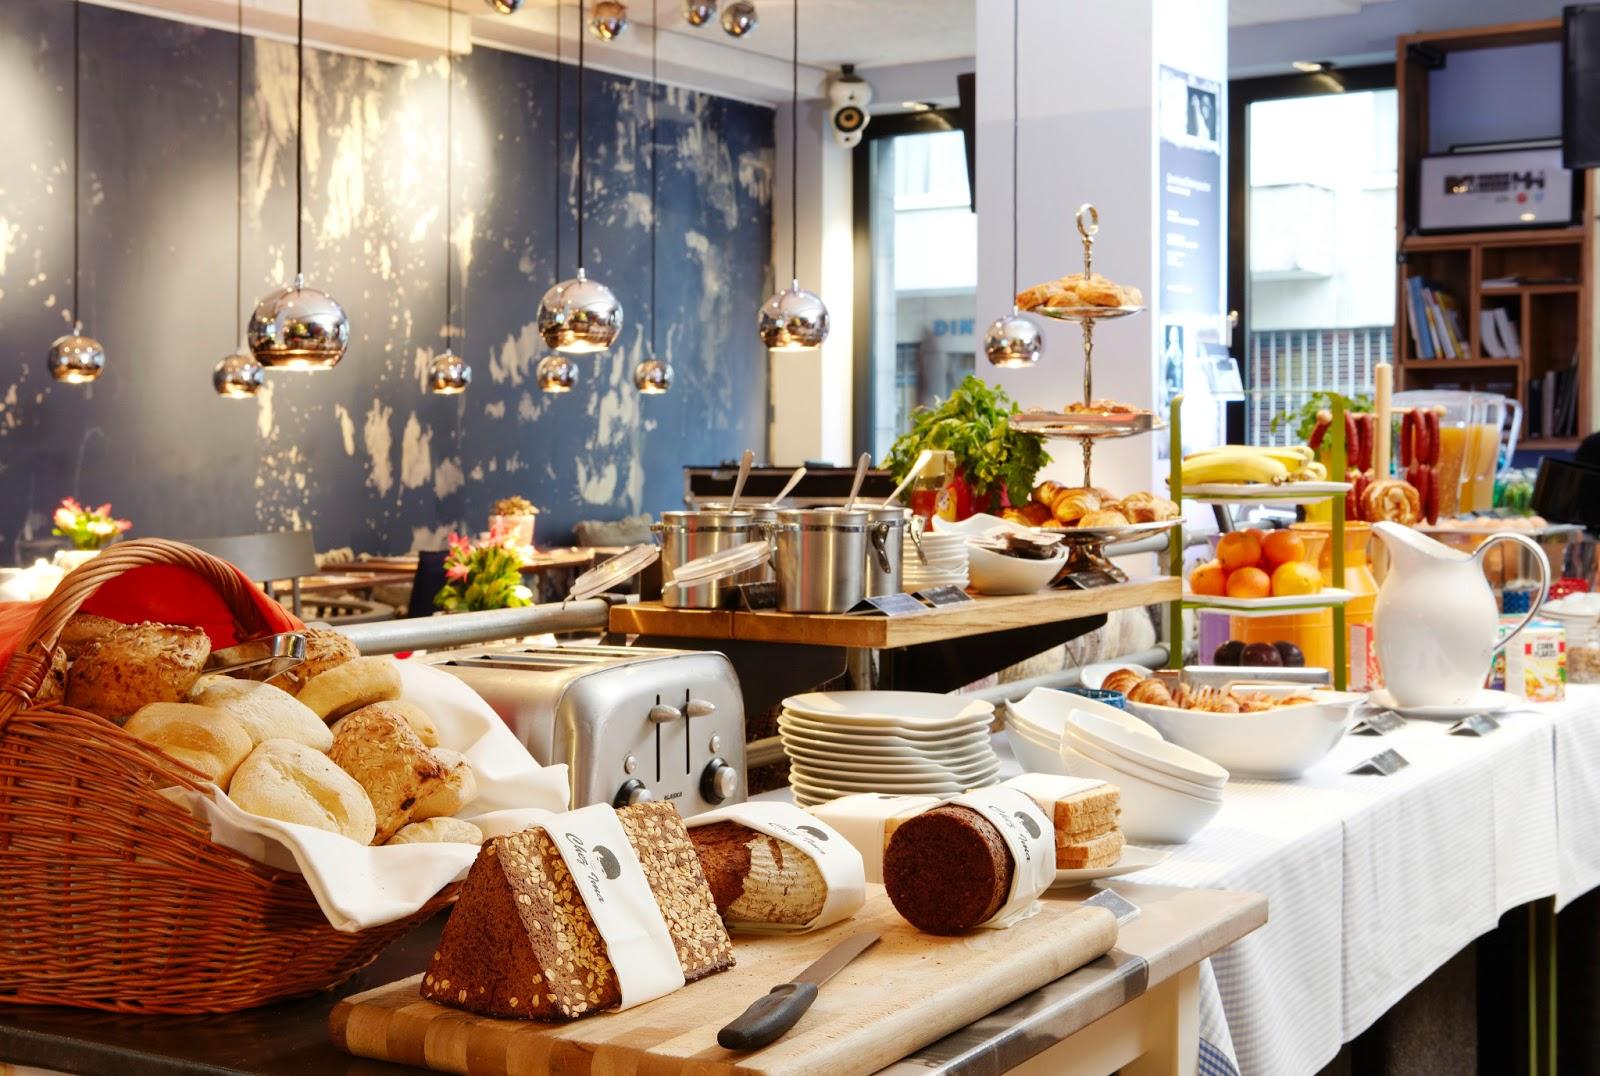 bettentdecker 24 stunden sind nicht genug 25hours hotel by levi 39 s in frankfurt. Black Bedroom Furniture Sets. Home Design Ideas